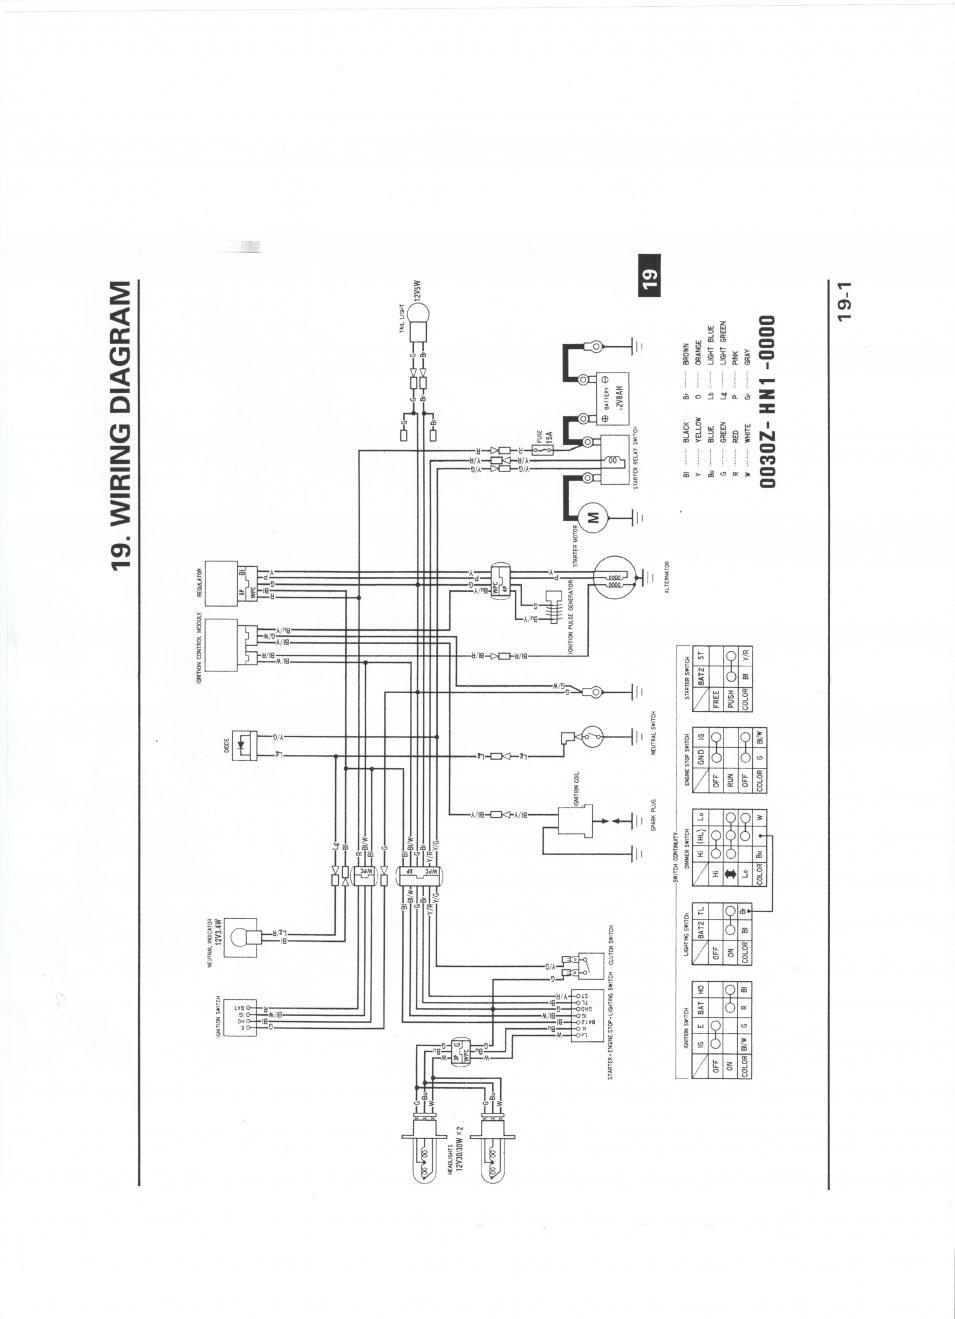 2001 honda 400ex wiring